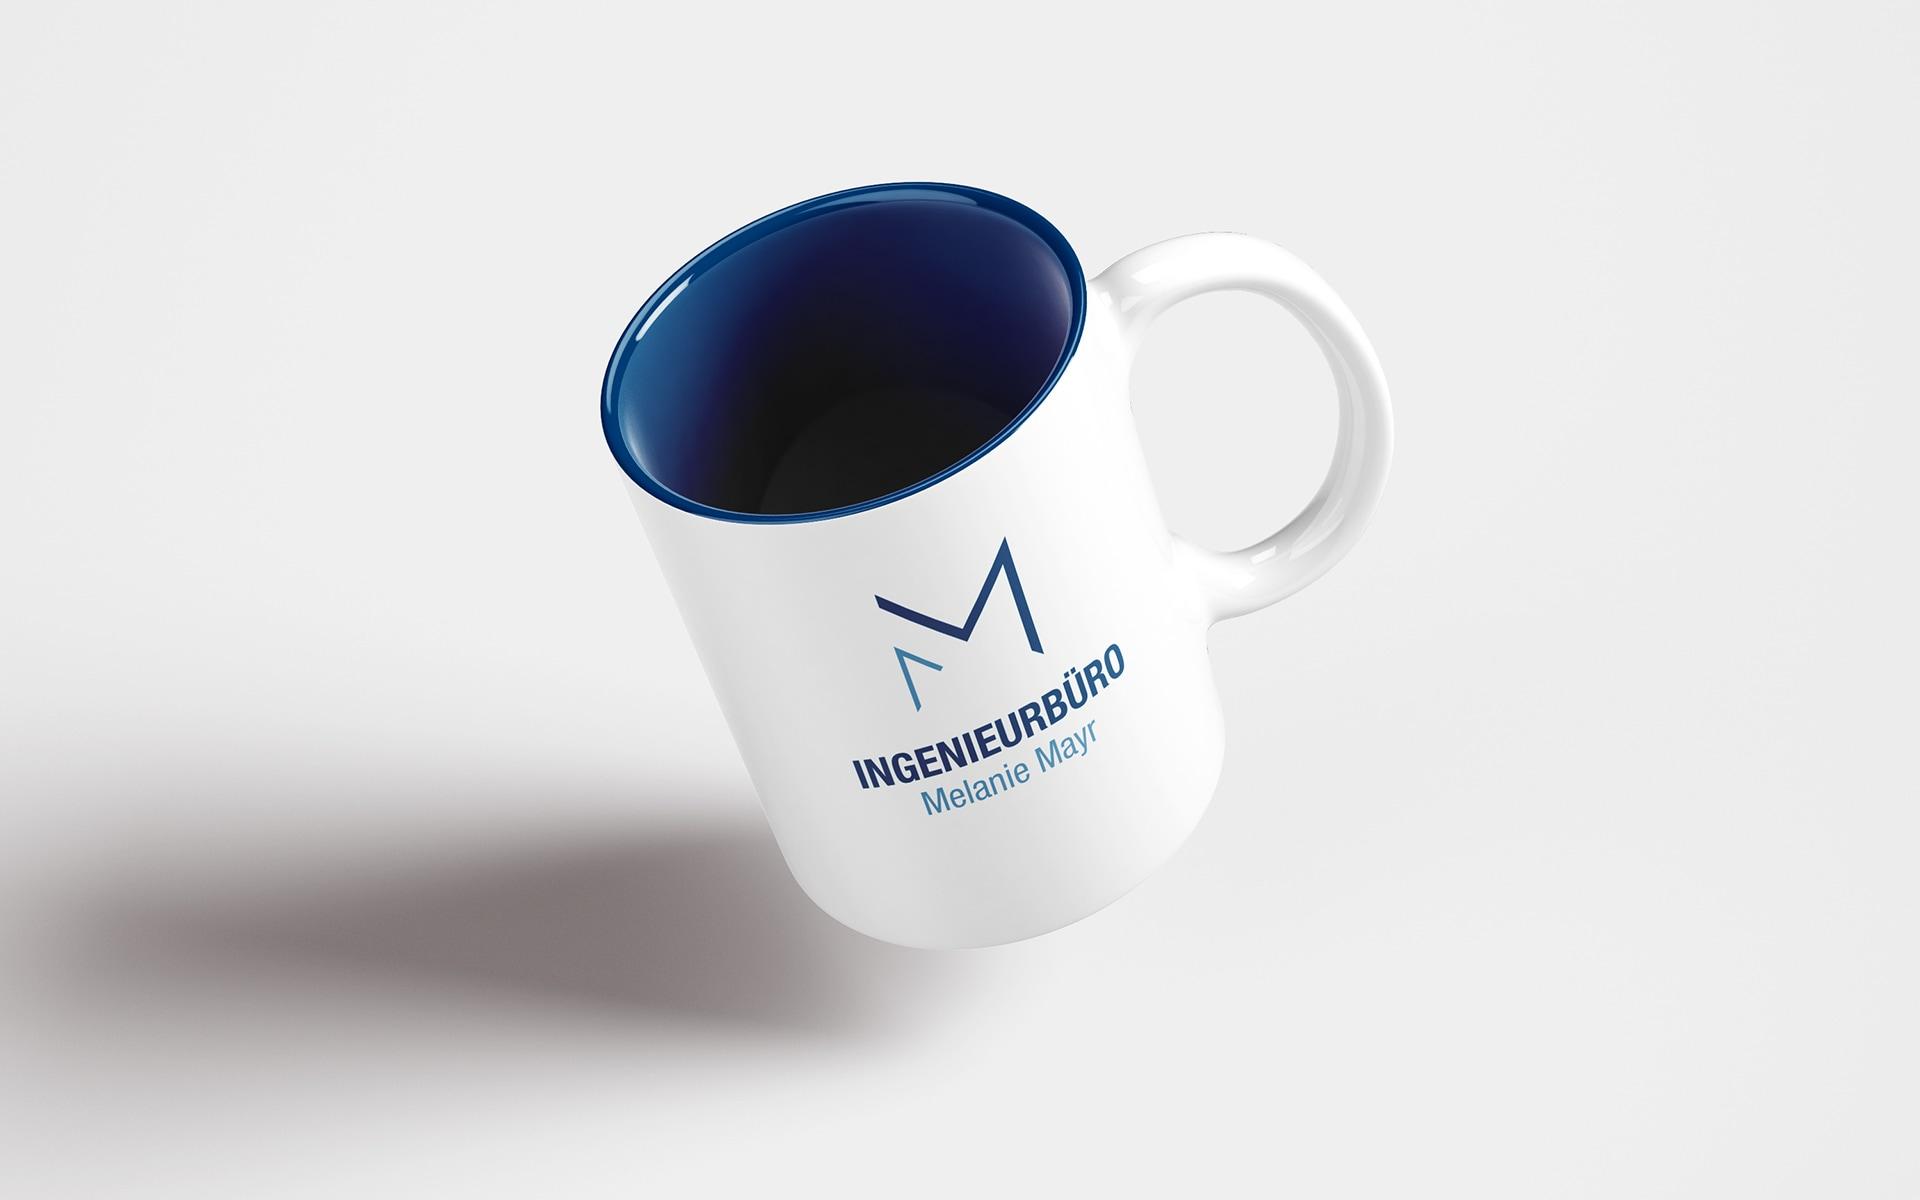 maxfath-ingenieurbuero-melanie-mayr-mering-branding-tasse